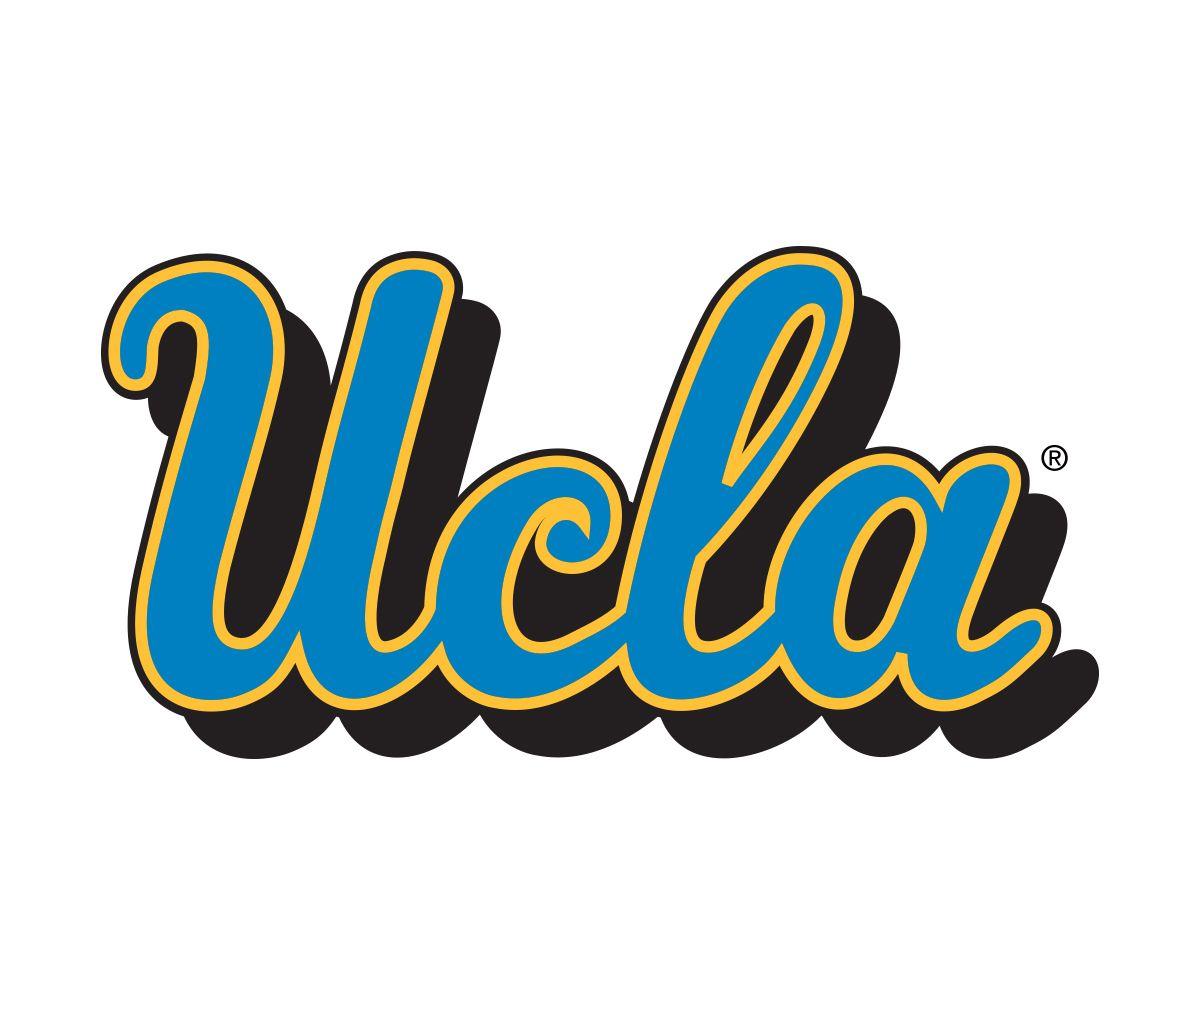 Logos Ucla Brand Guidelines Ucla Bruins Ucla College Logo